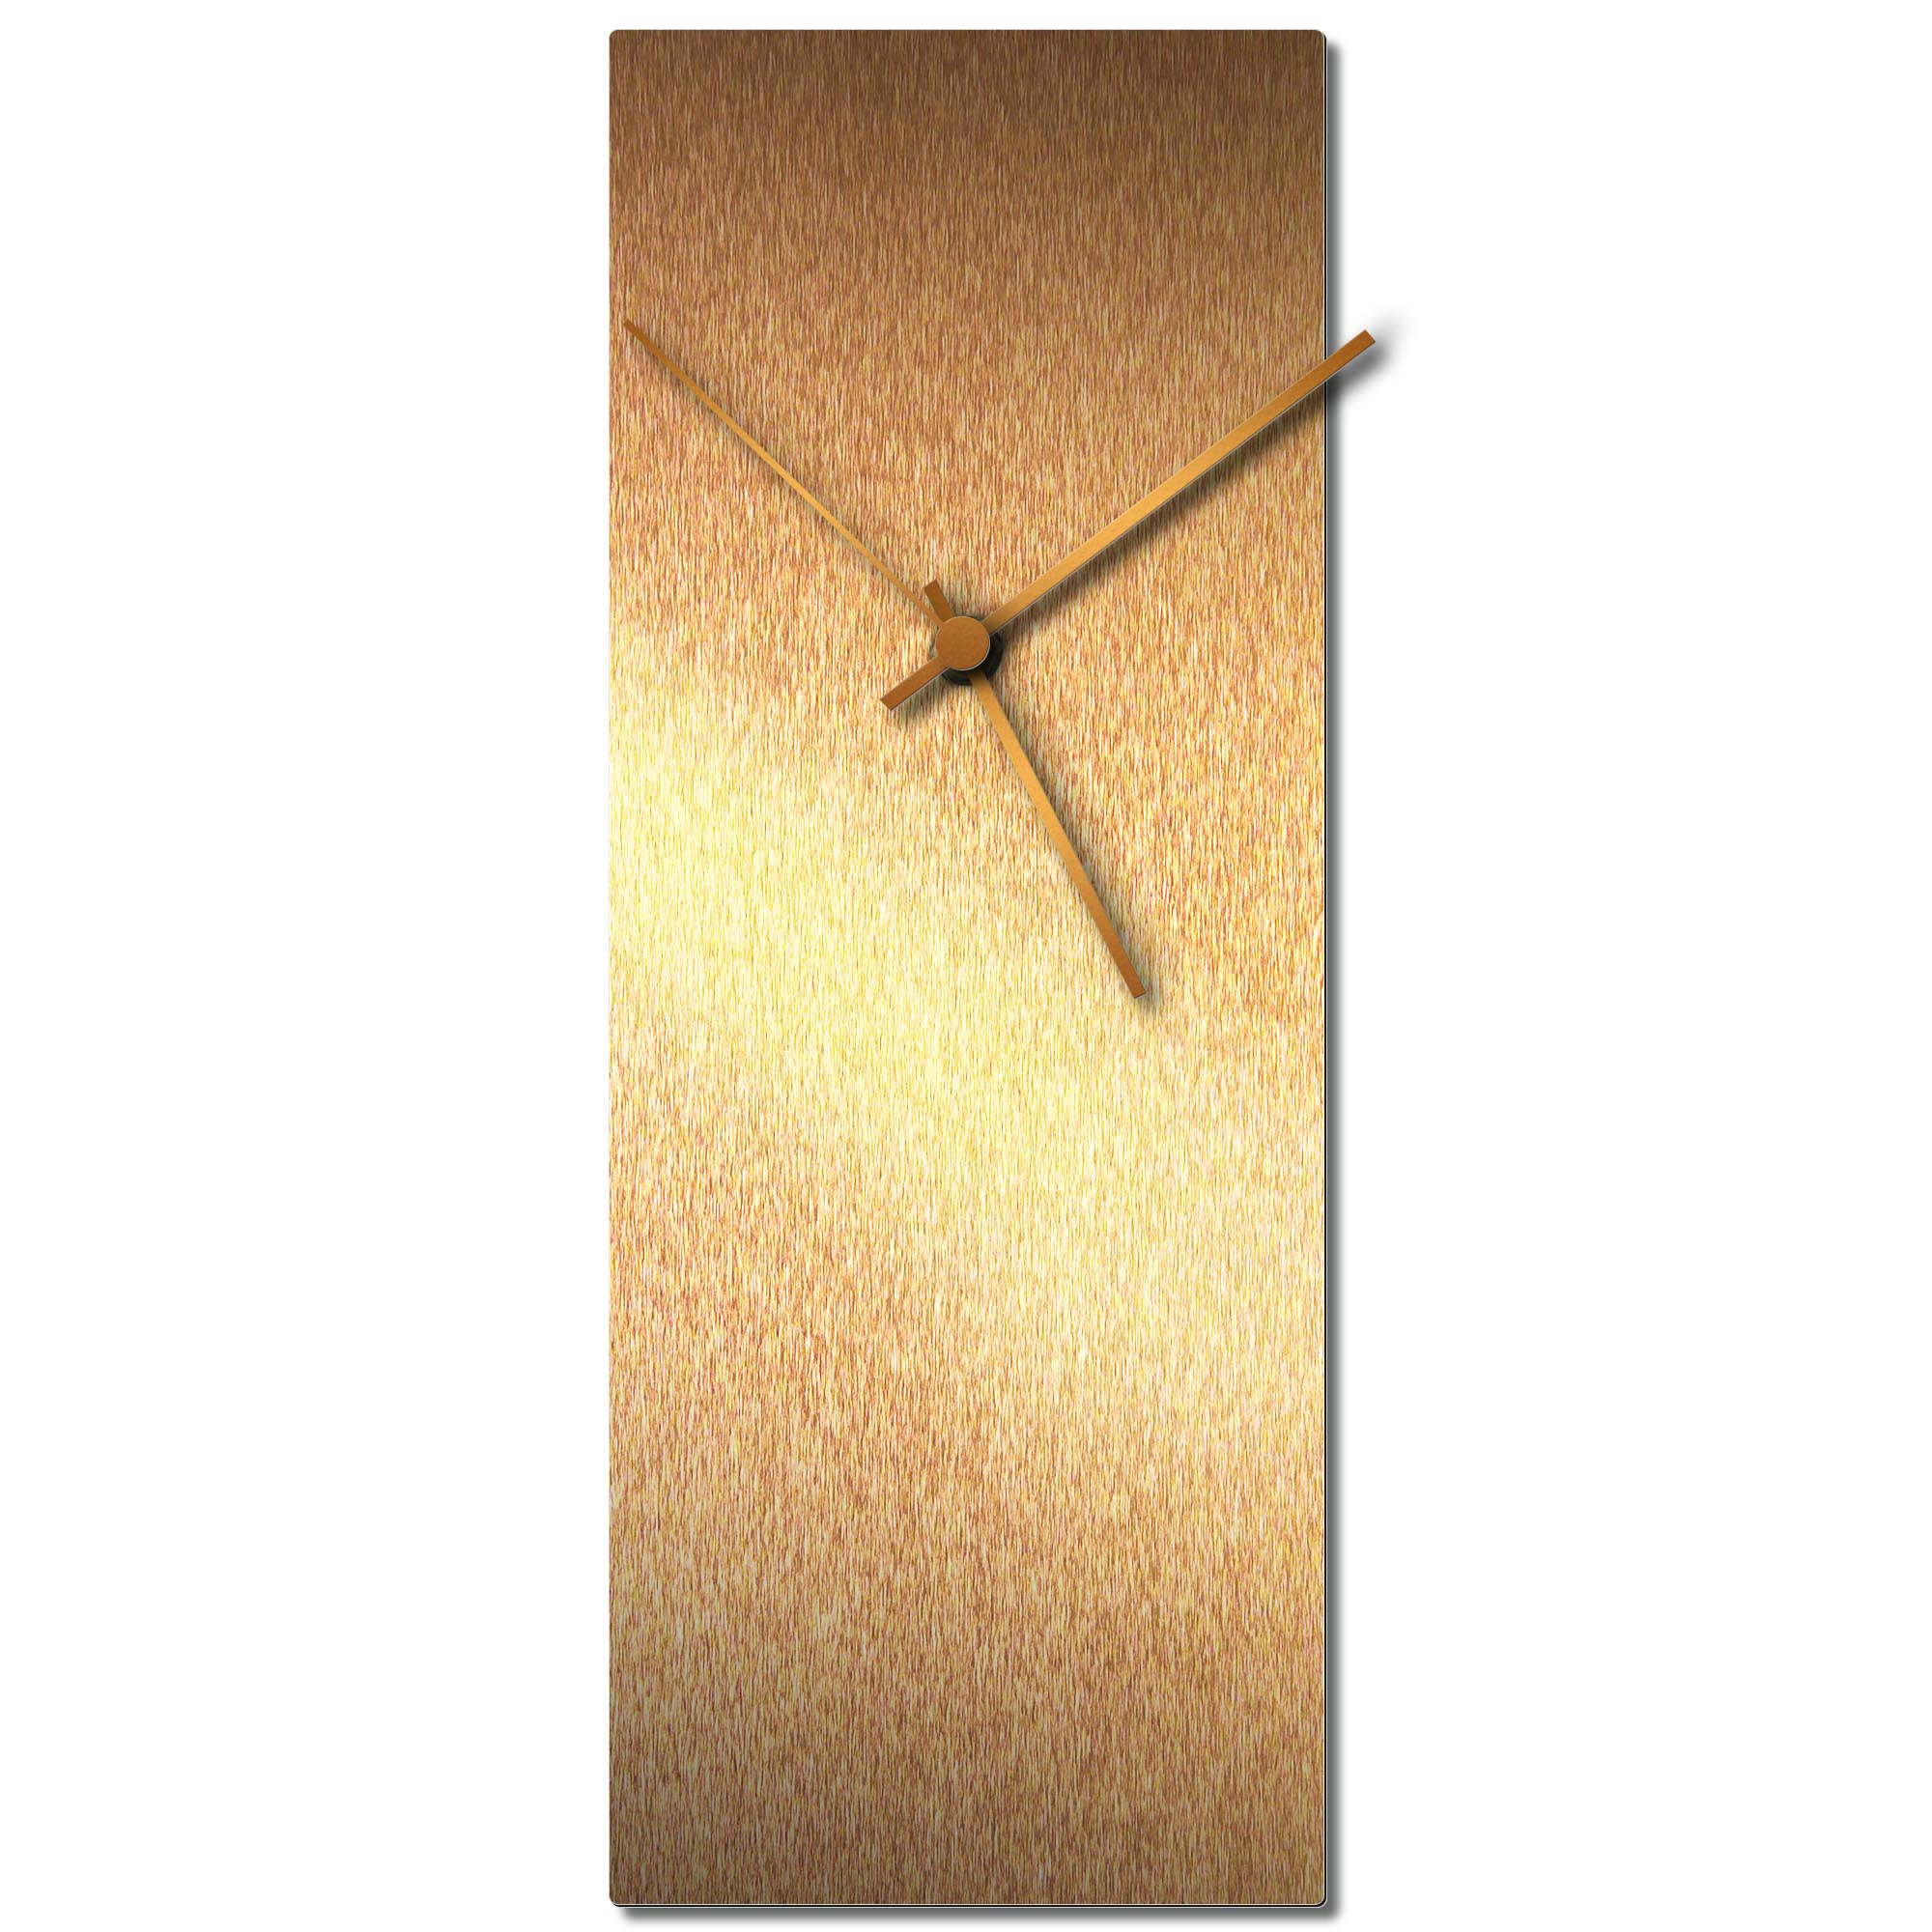 Adam Schwoeppe 'Bronzesmith Clock Bronze' Midcentury Modern Style Wall Clock